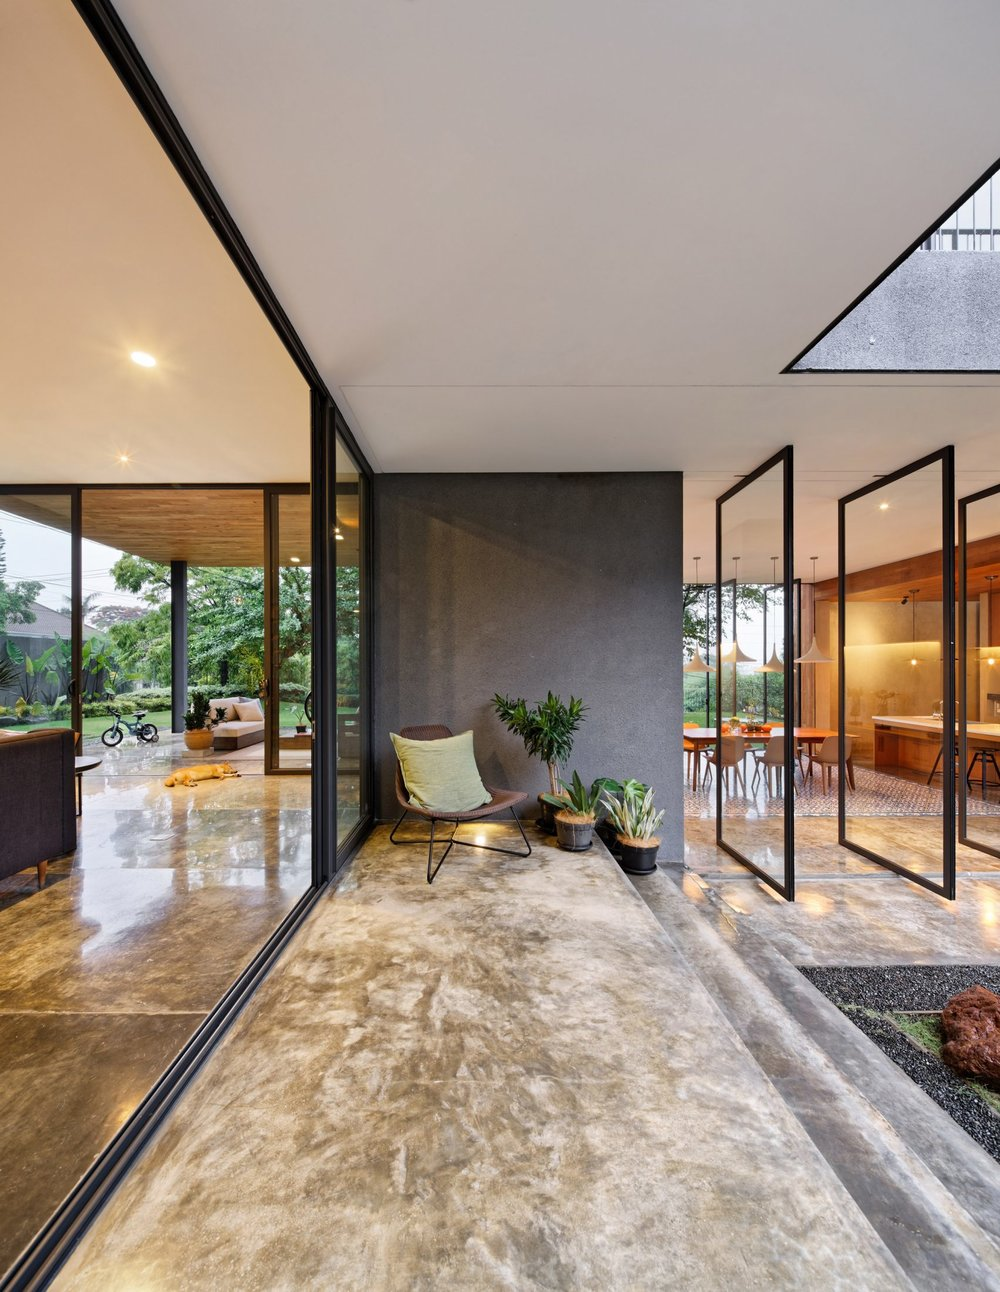 house-inside-outside-tamara-wibowo-architecture-residential-indonesia_dezeen_2364_col_3-1704x2202.jpg